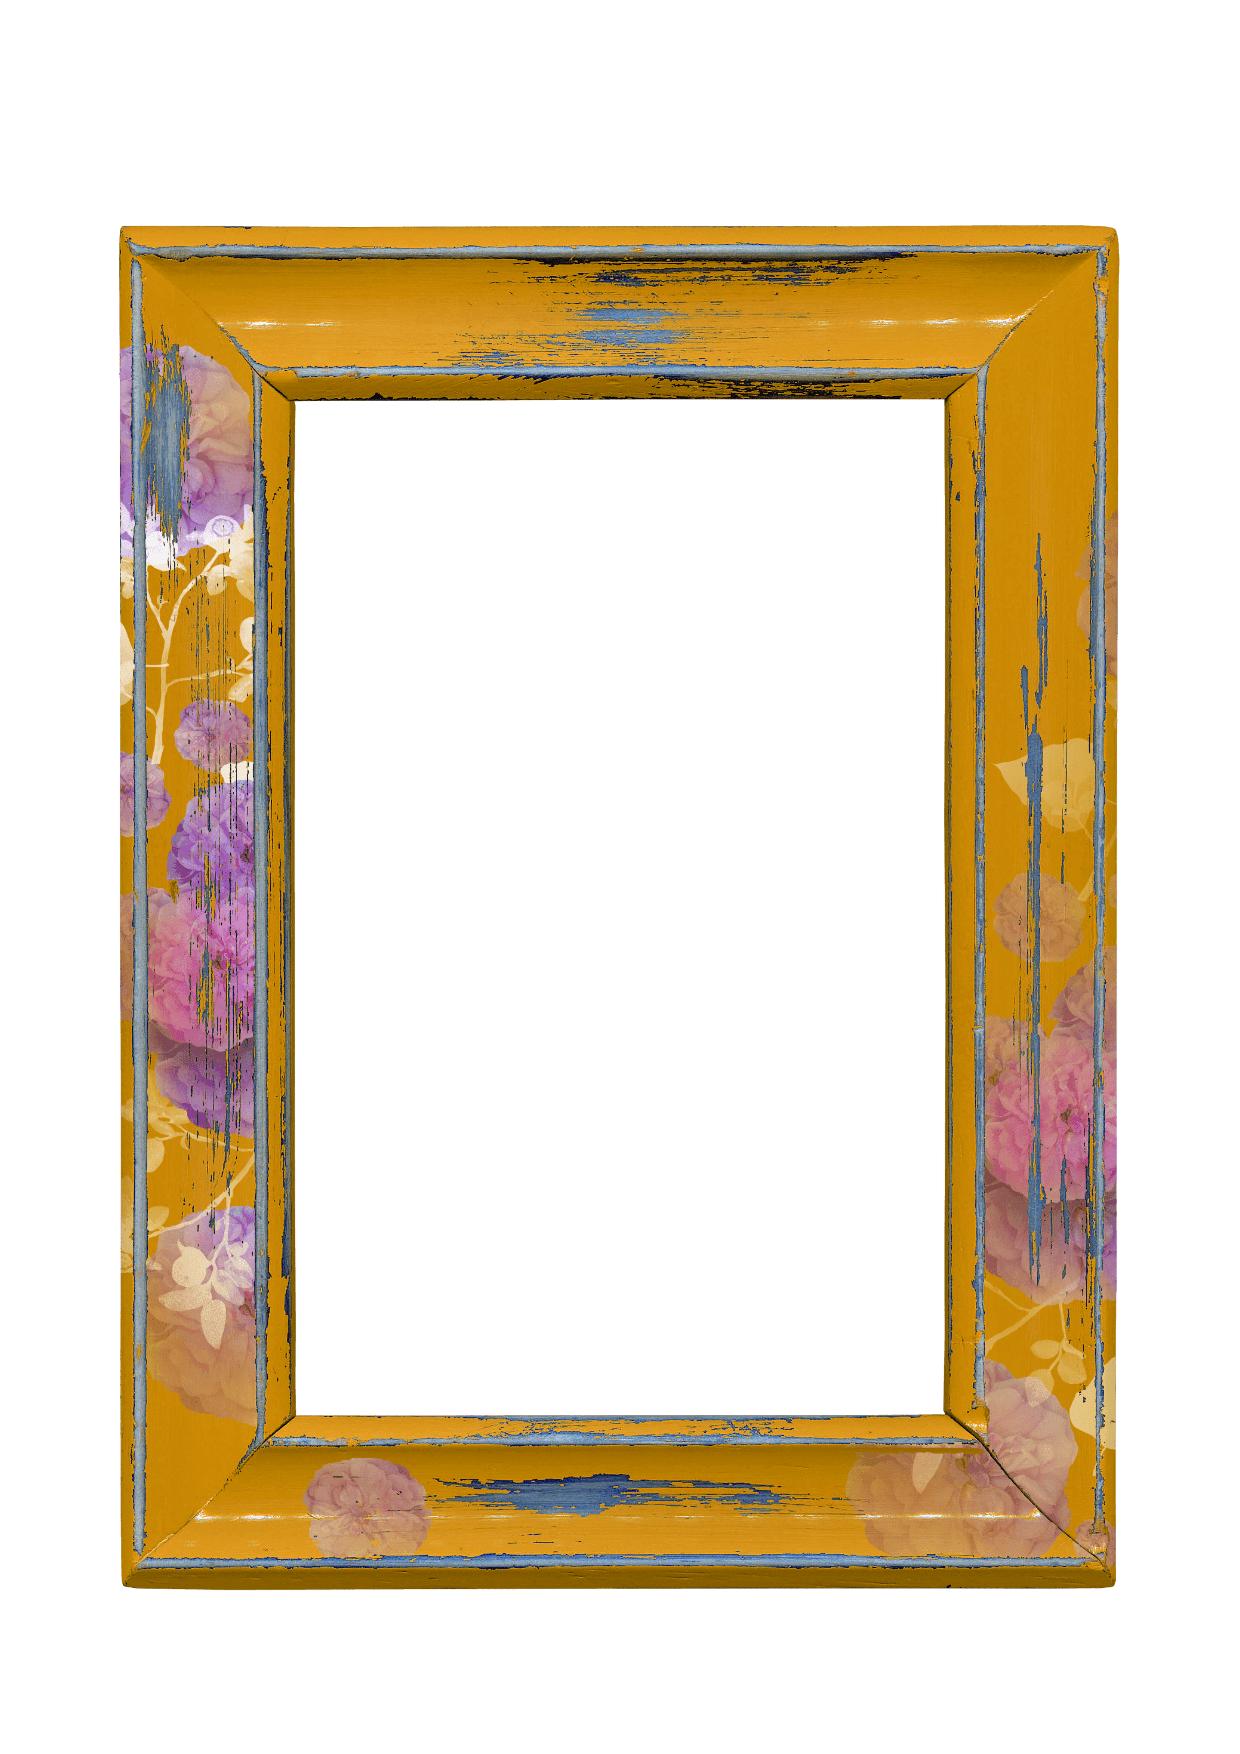 Frame,                White,                Yellow,                 Free Image